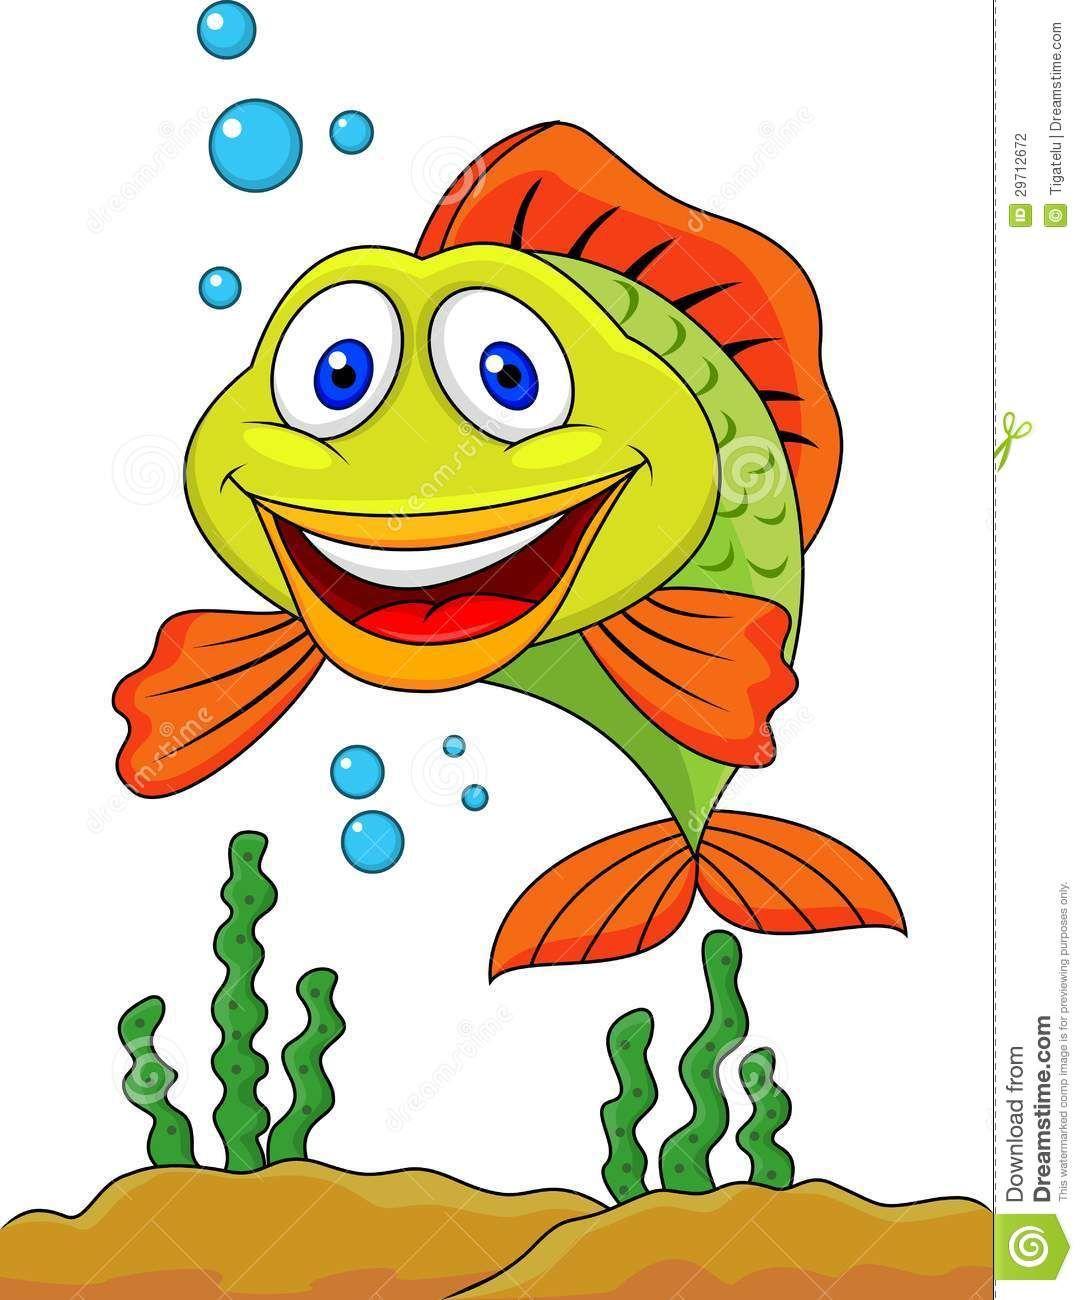 Digital mermaid clip art printable mermaid download clipart graphics images 4 75 usd by digitaldollface